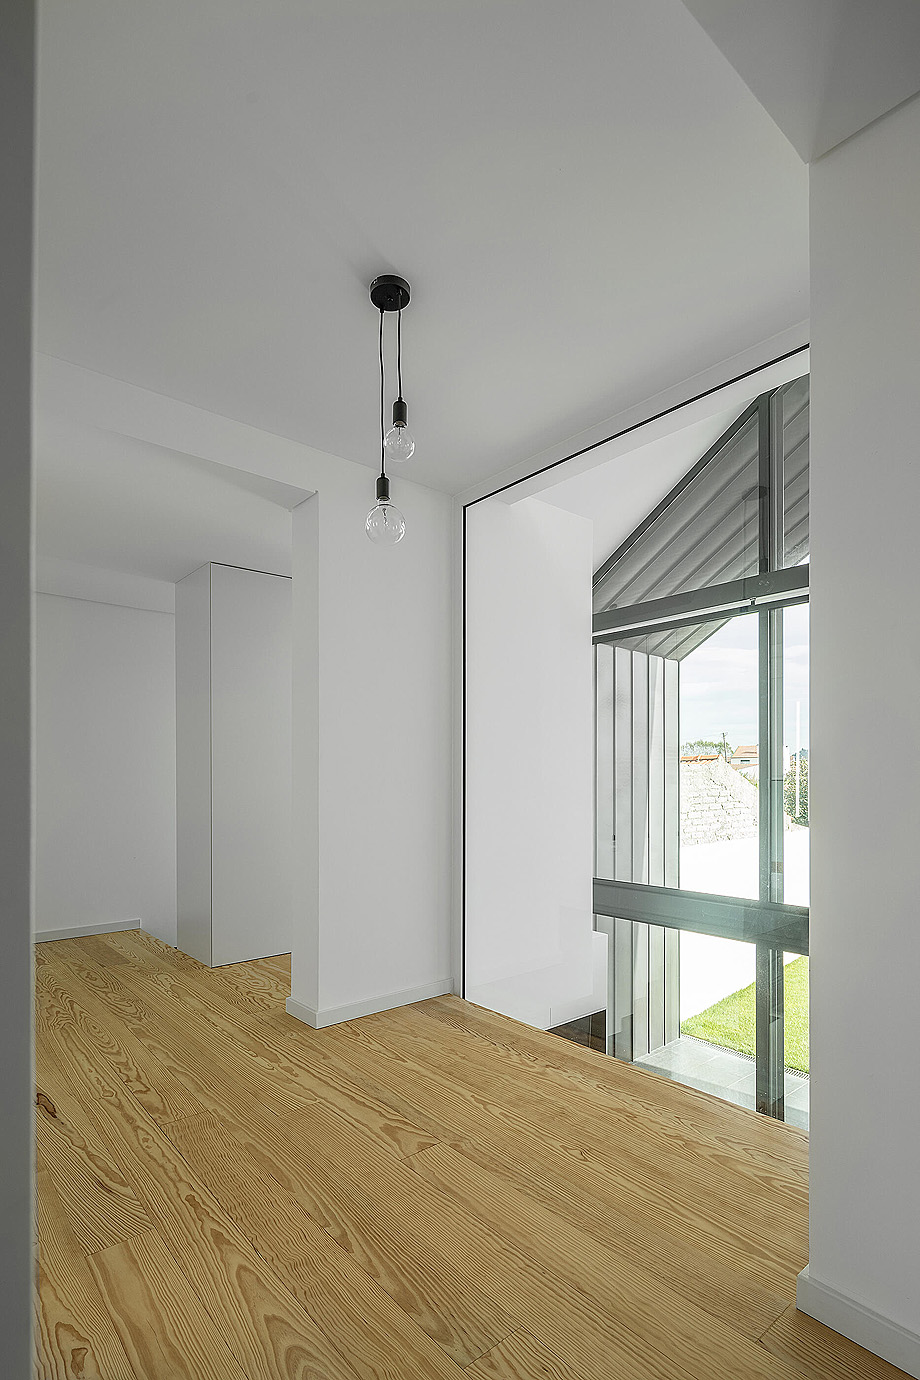 casa do arco de frari architecture network - foto ivo tavares (28)